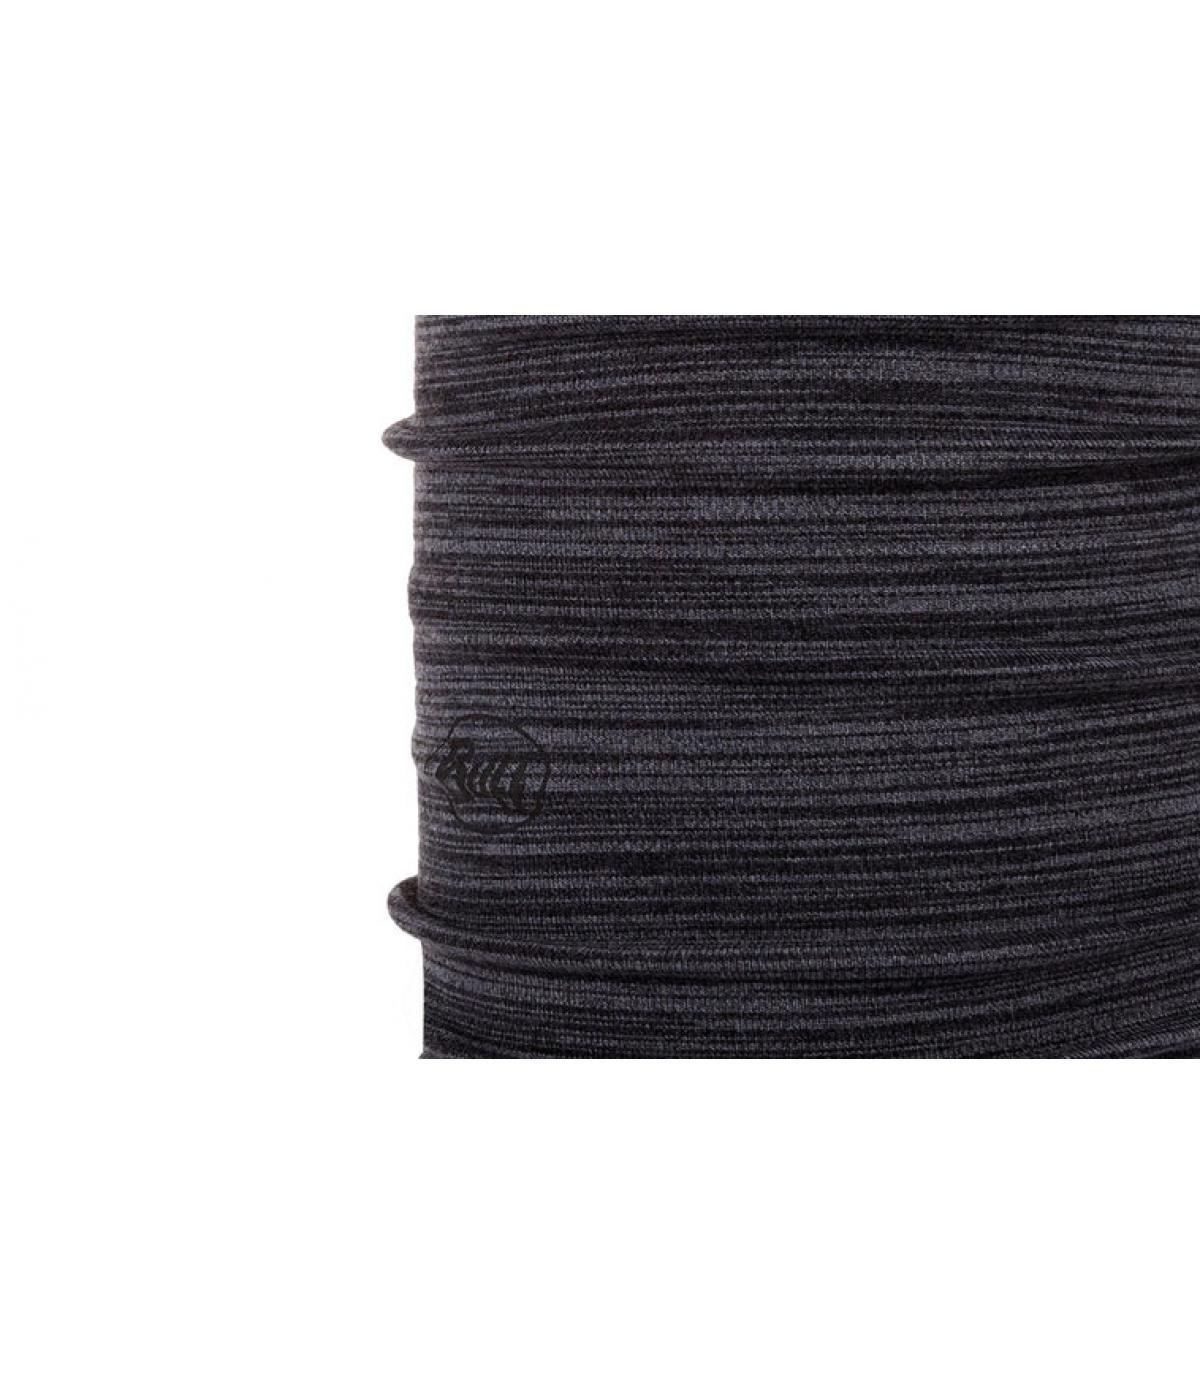 Details Midweight Merino Wool light grey melange - Abbildung 2